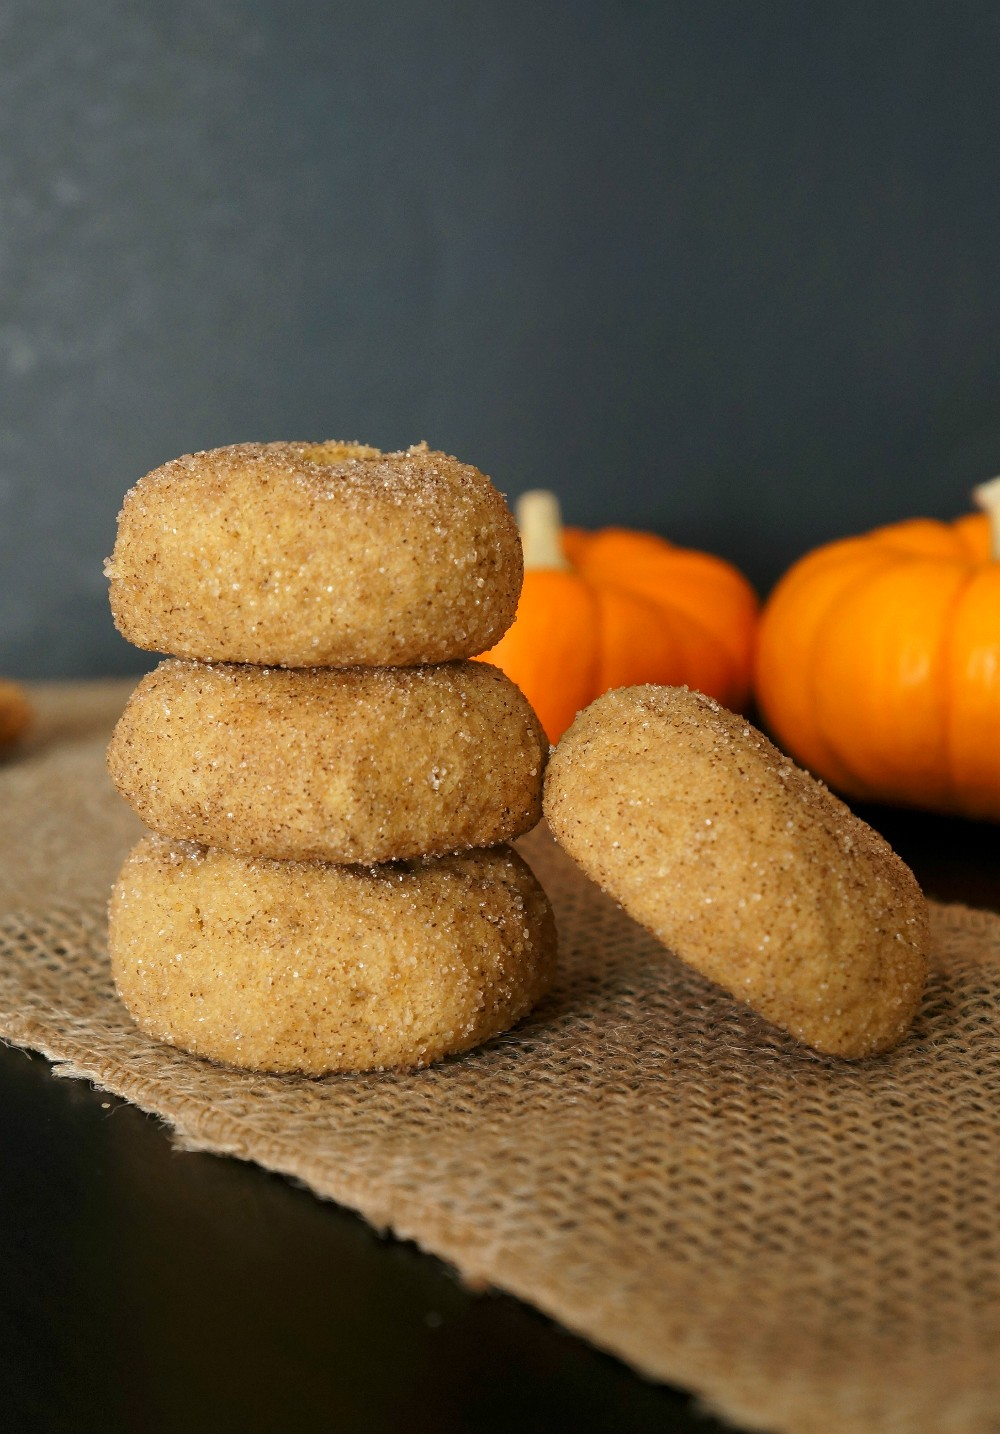 Soft Baked Gluten Free Pumpkin Spice Snickerdoodles Recipe